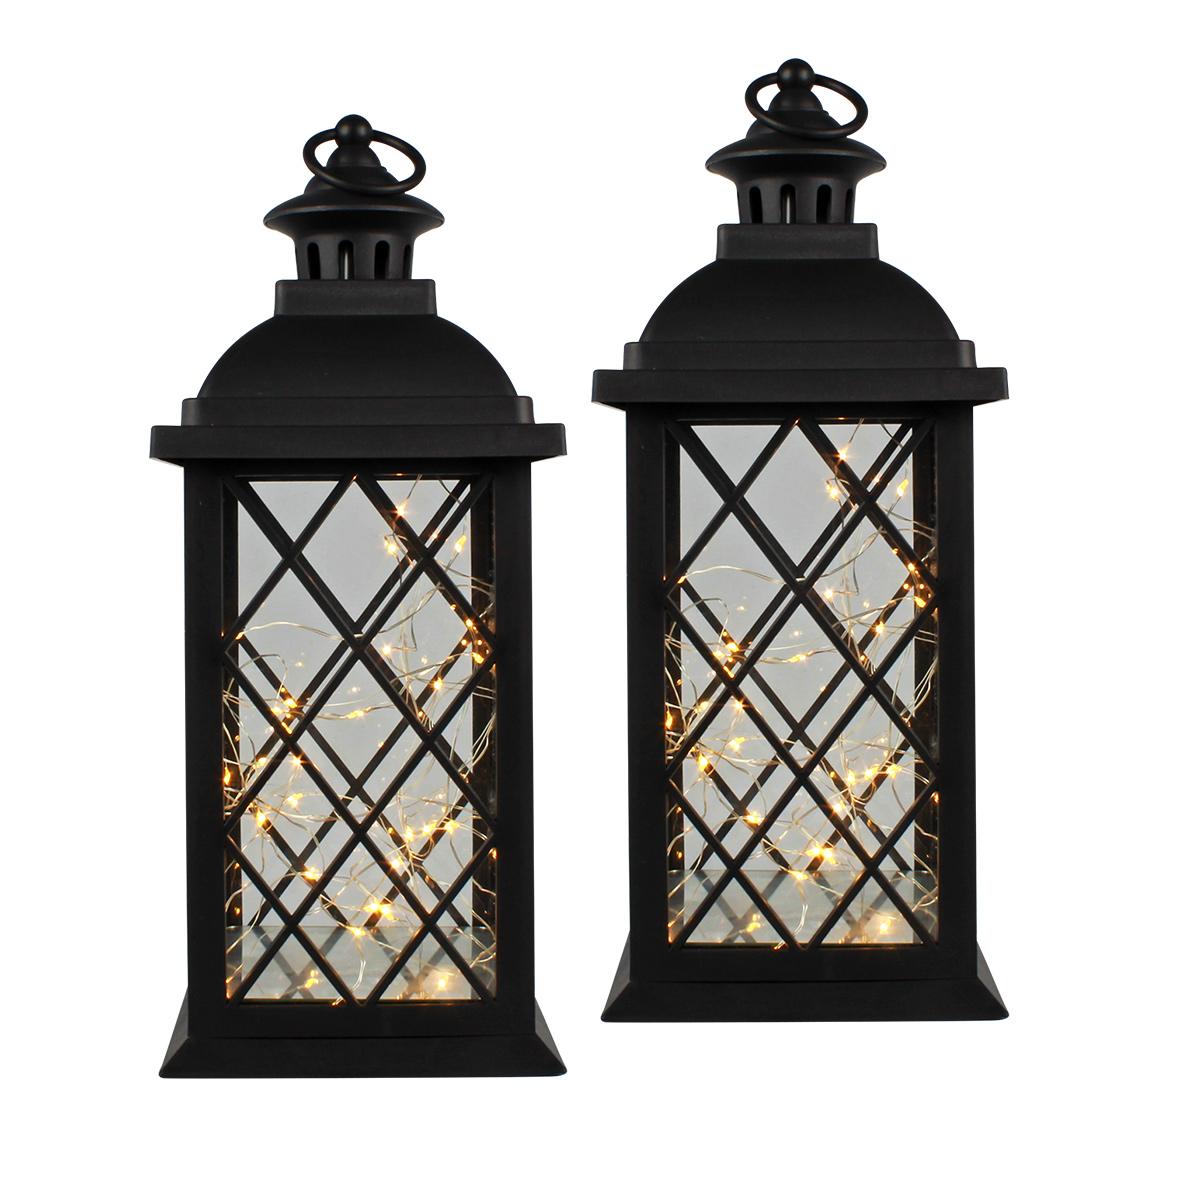 Conj. C/ 2 Lanternas Marroquinas Decorativas LED Pretas 37cm